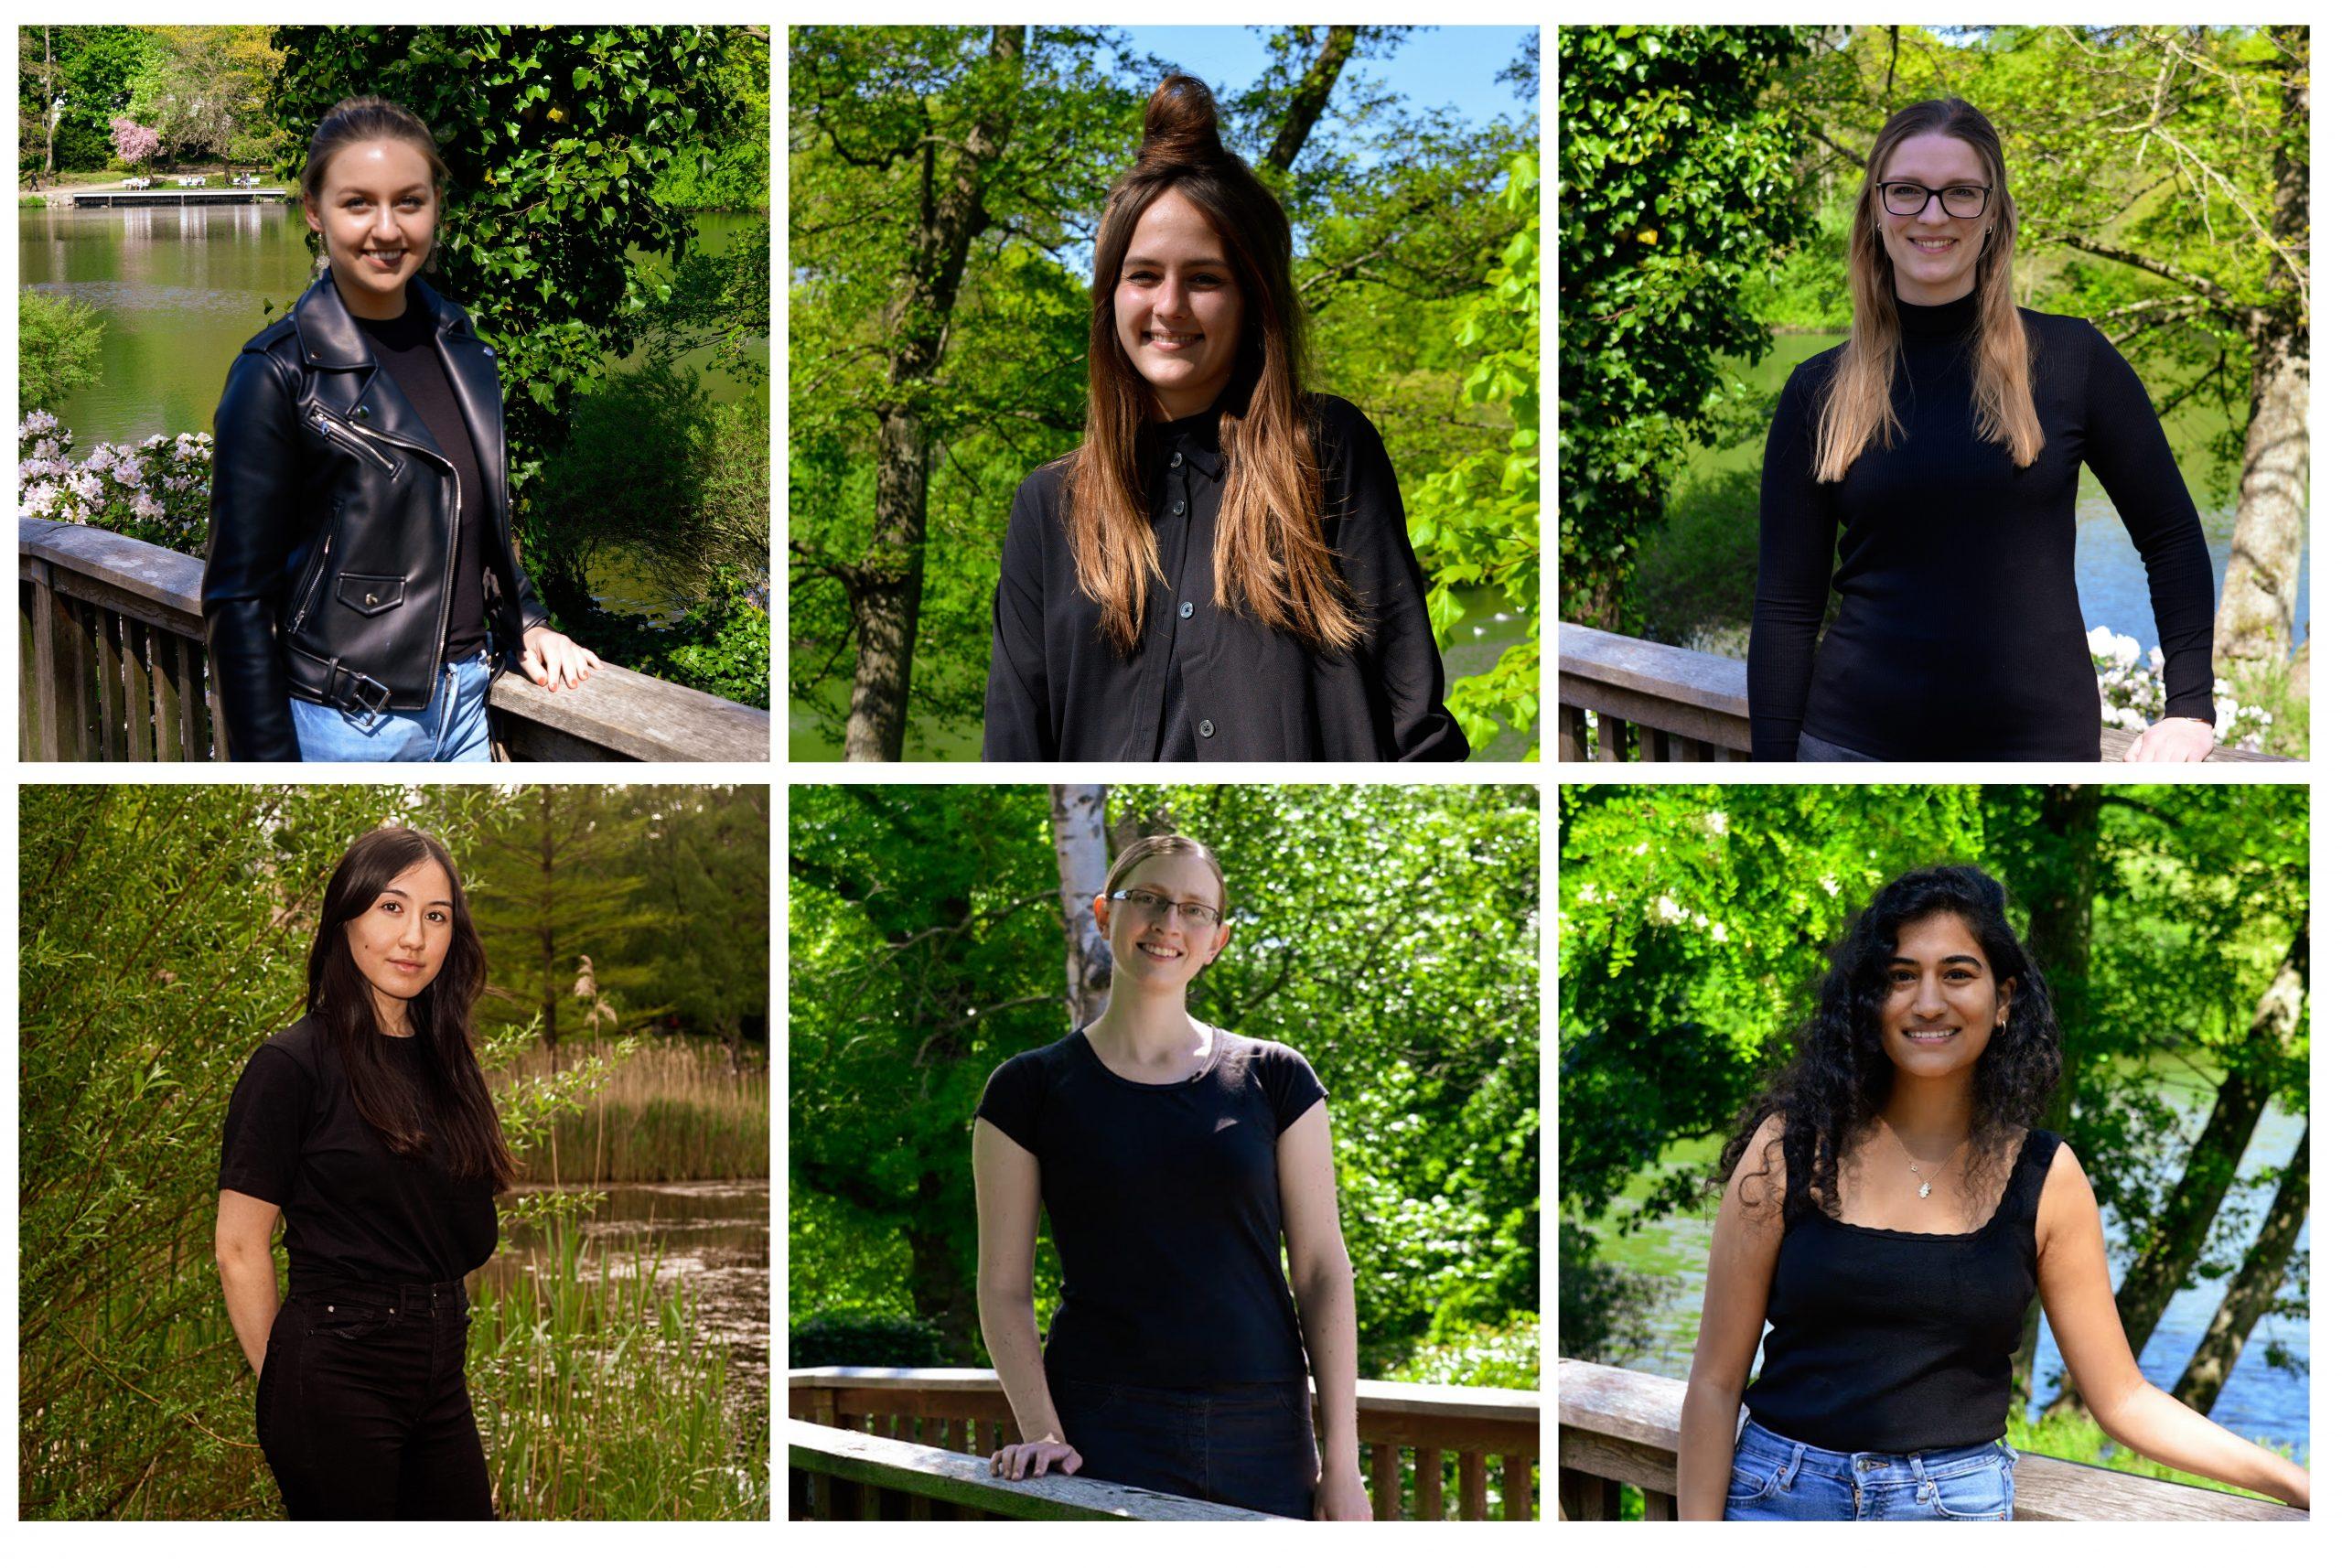 Jessica Schulz, Tamina Spilker, Lynn Adler, Chantelle Bissinger, Katja Döbel und Dilan Goeren